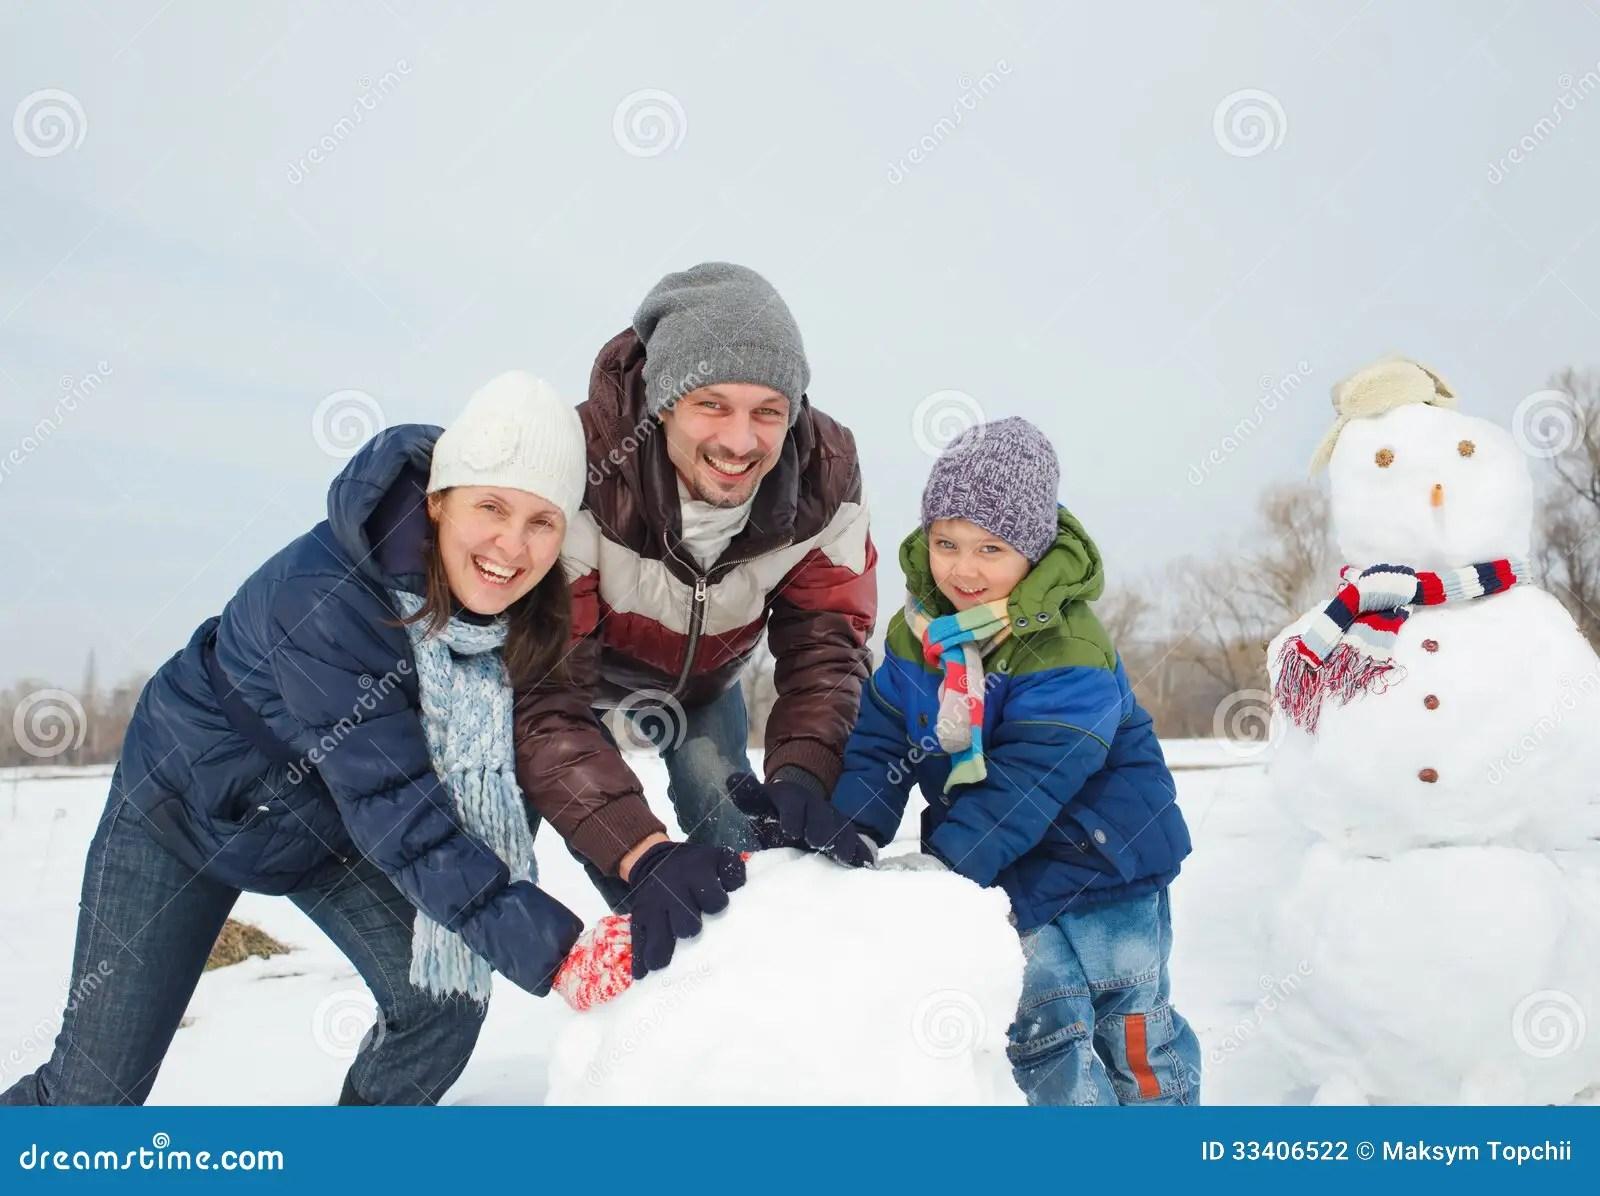 Family Make A Snowman Stock Photo Image Of Beauty